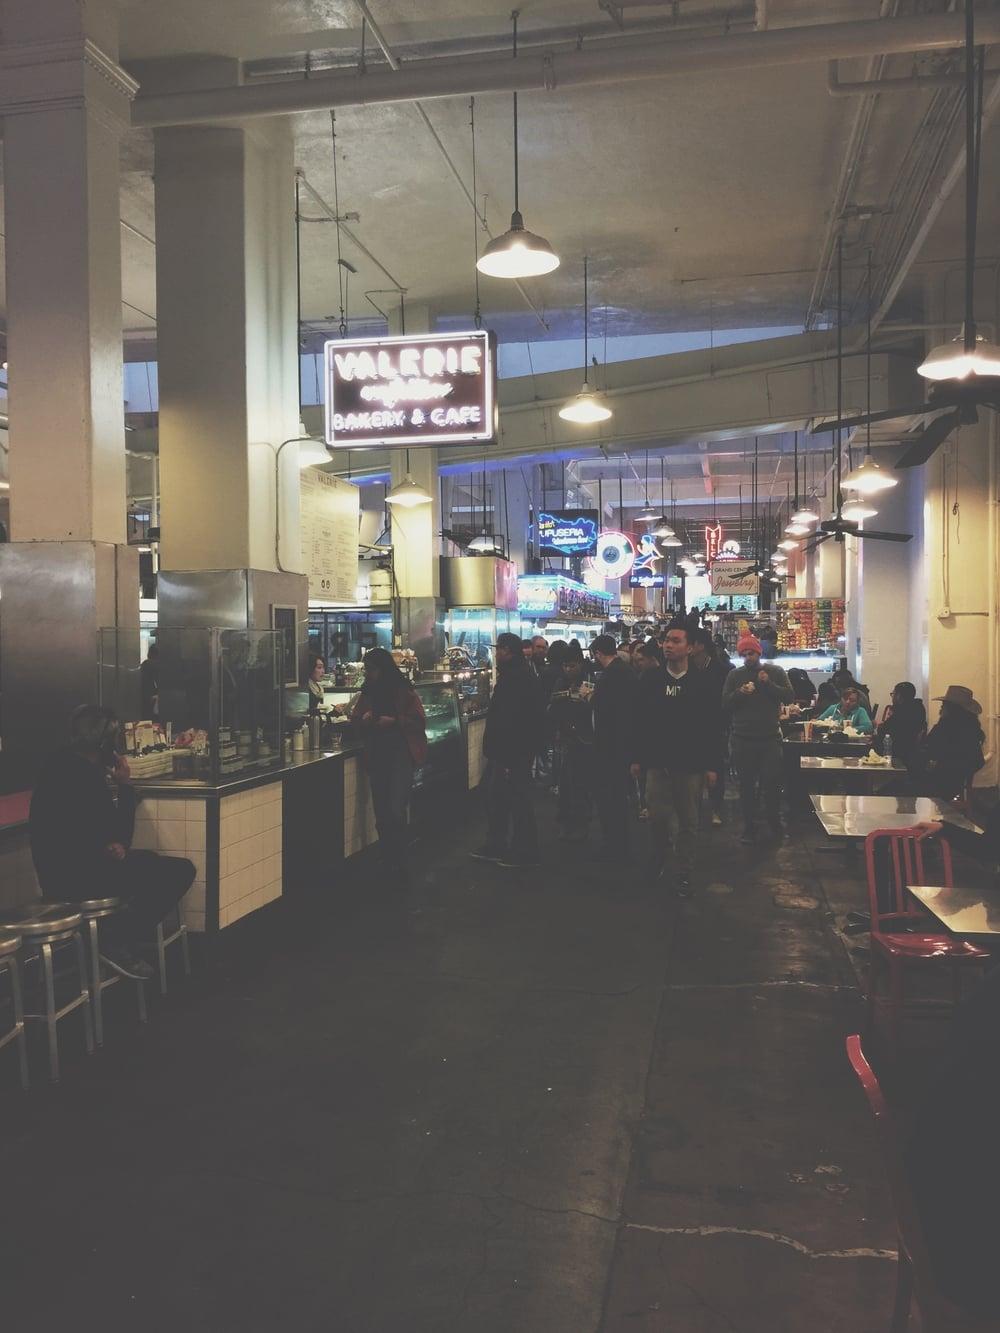 downtown la's grand central market